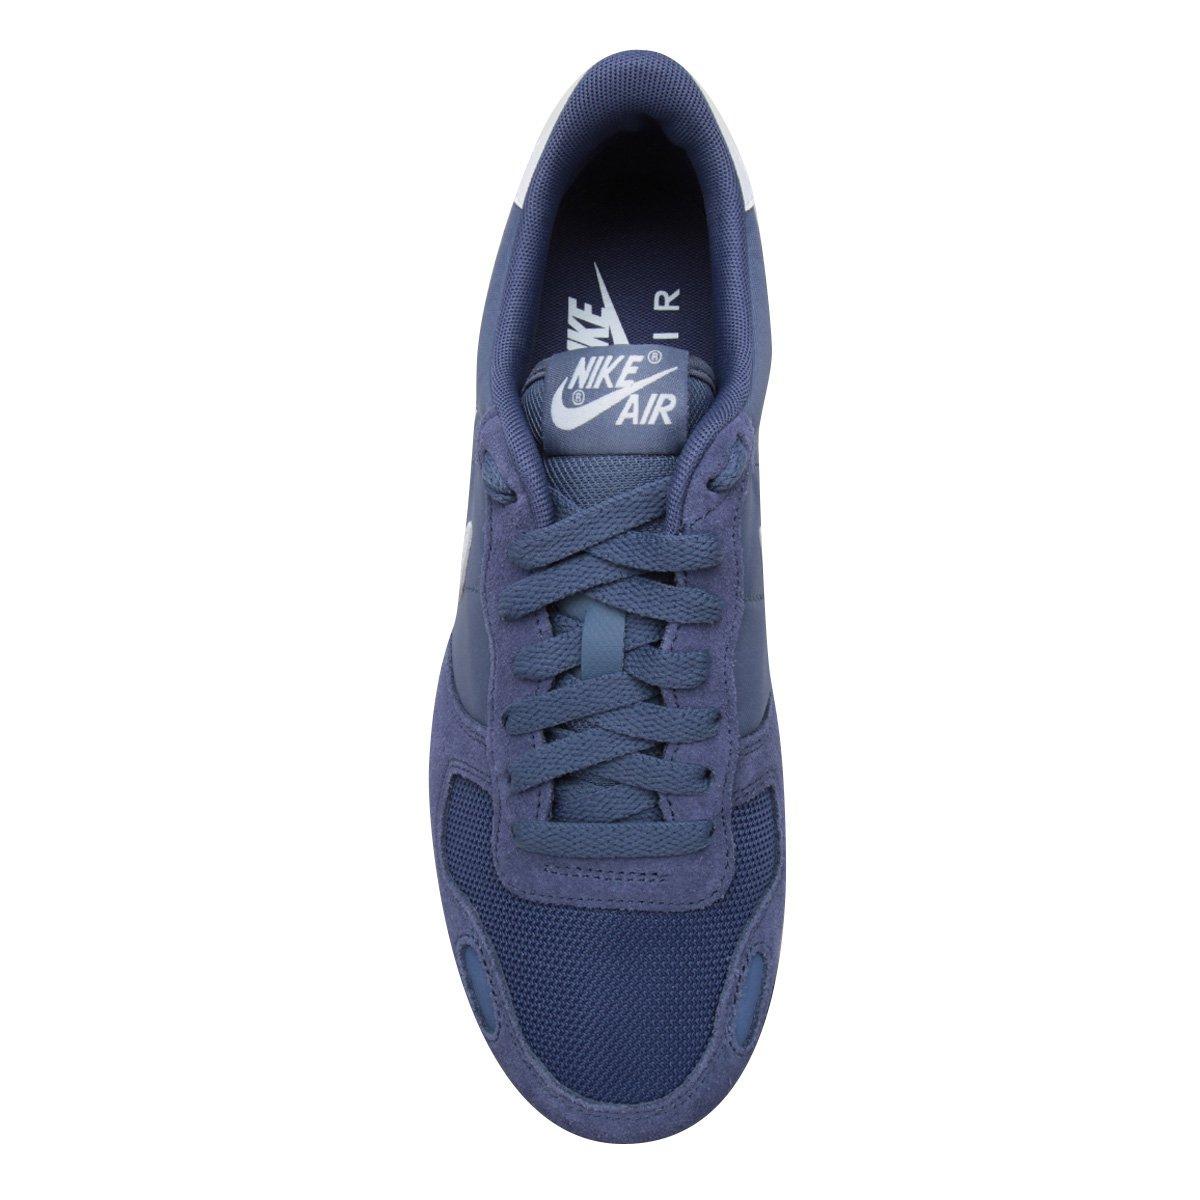 Air Masculino Vrtx Masculino Tênis Nike Branco e Air Branco Nike Azul Tênis Vrtx qx0fAO